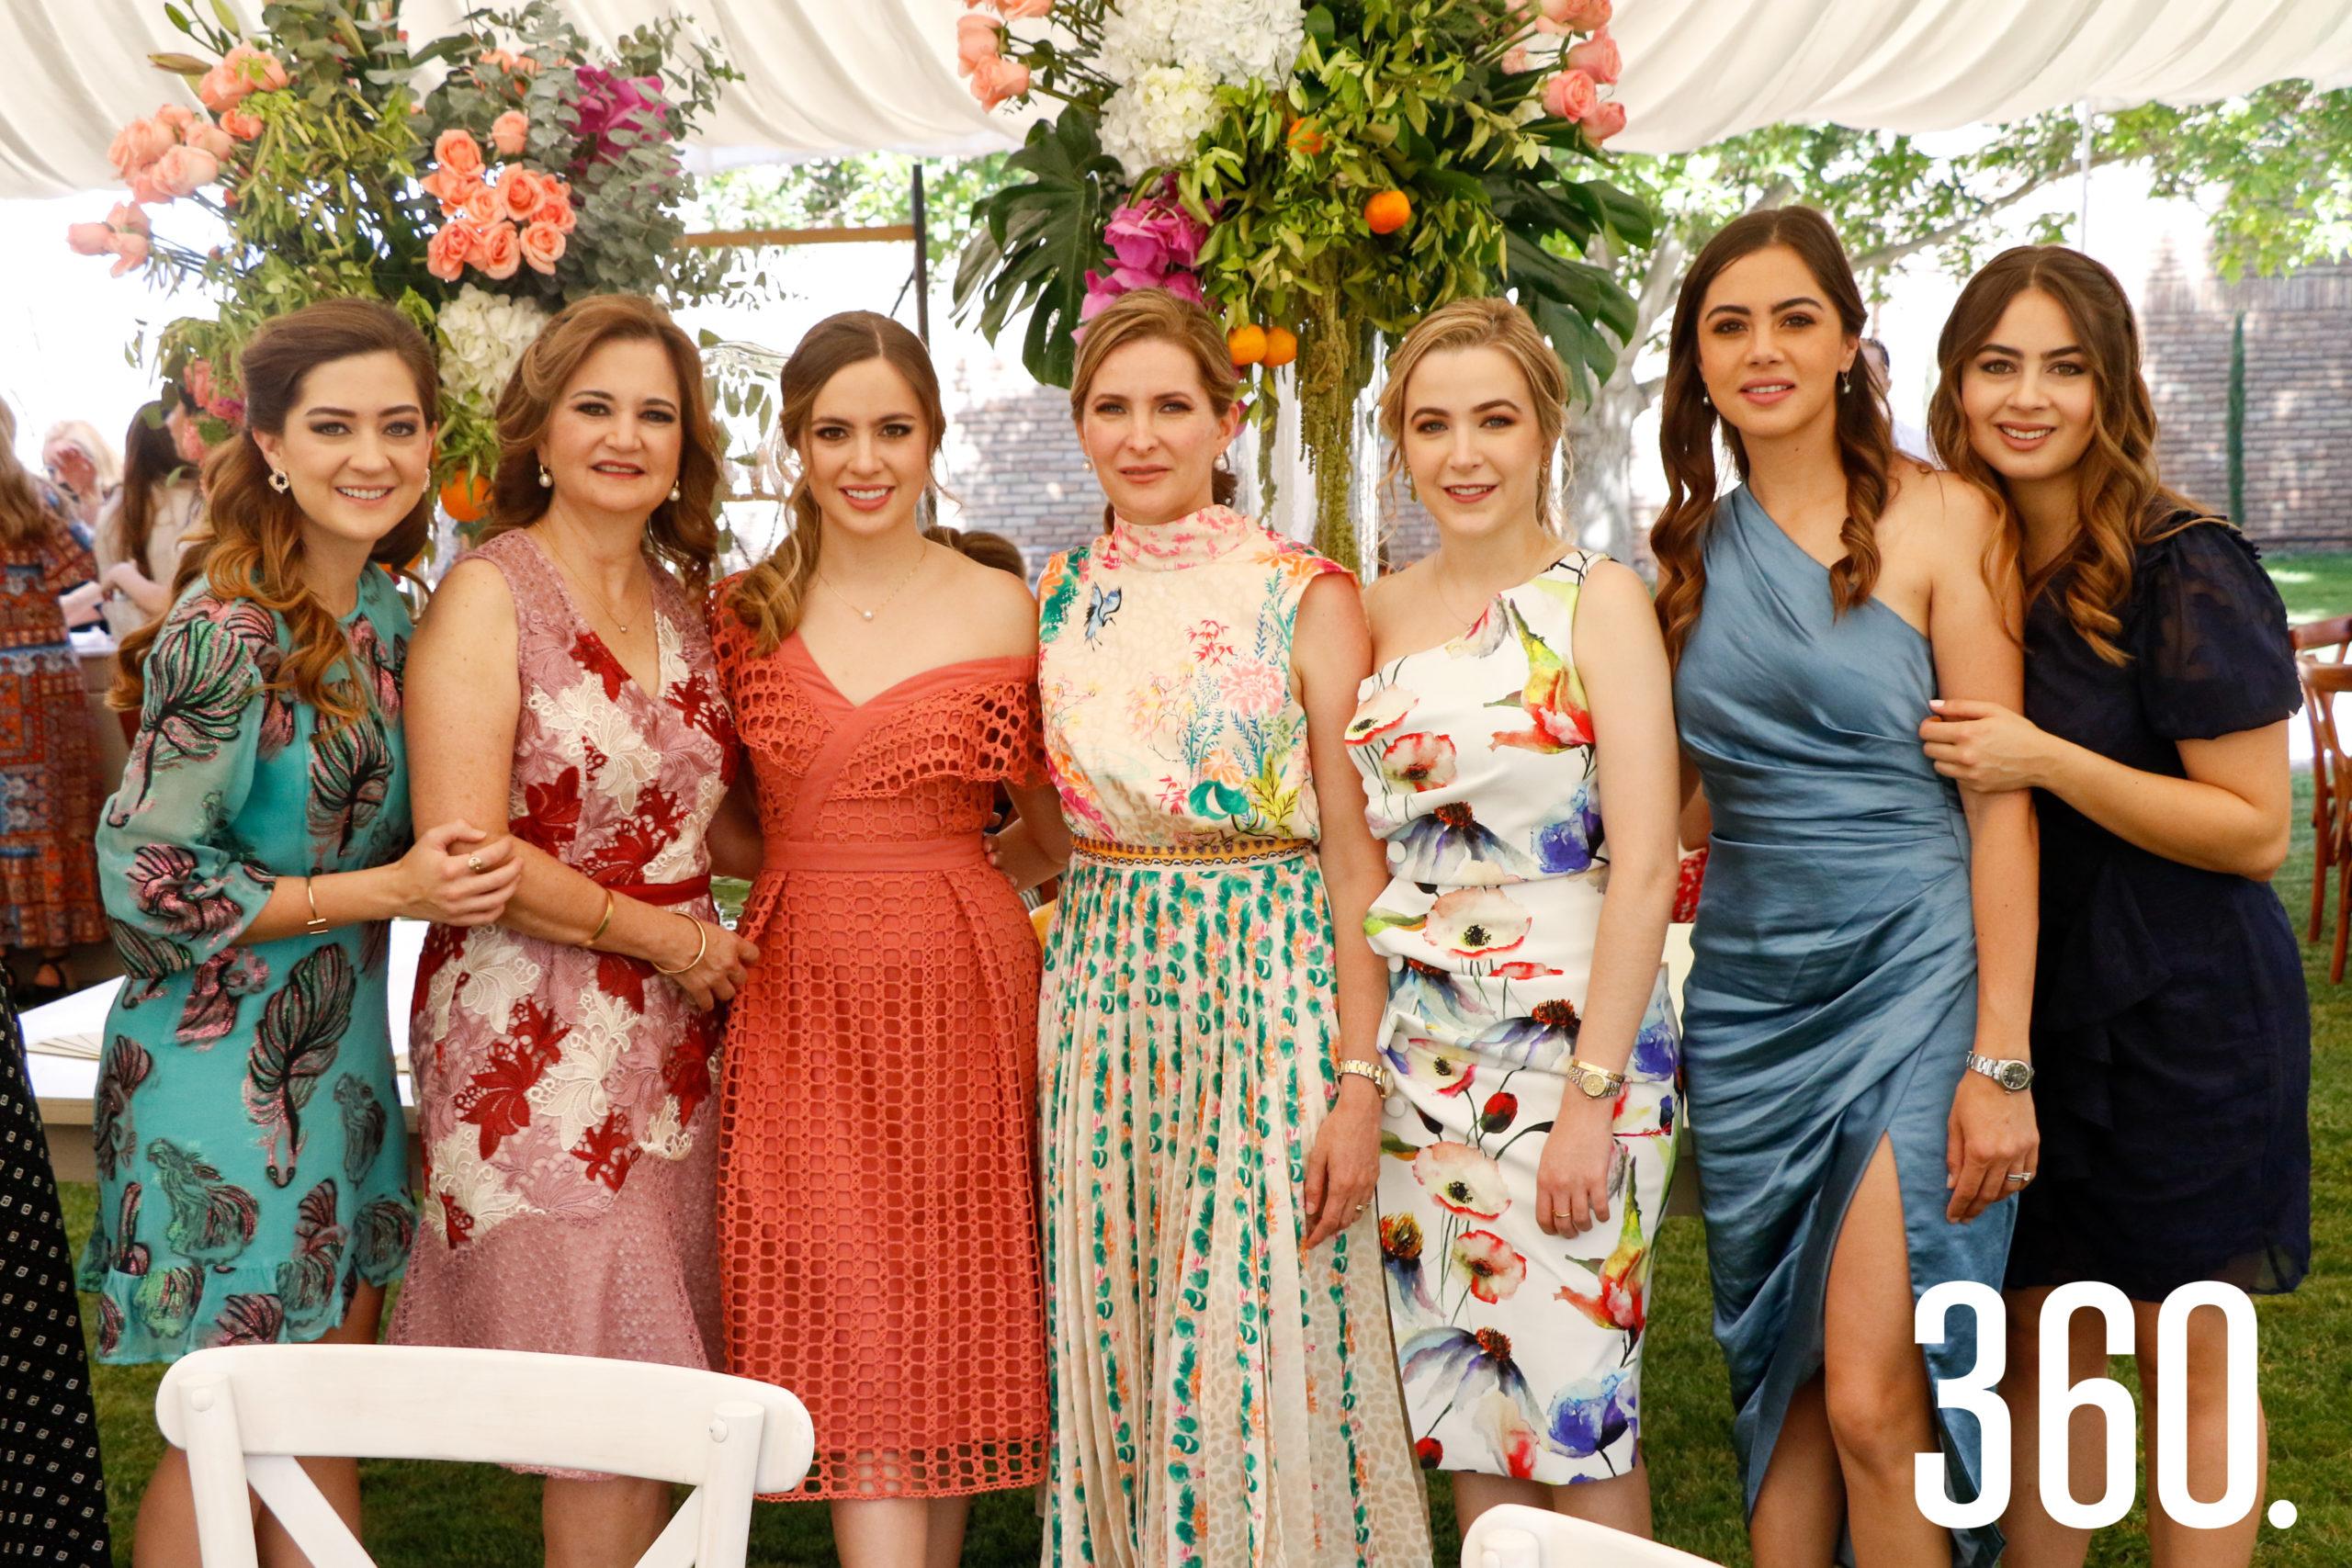 Paulina Arsuaga, Fernanda Osuna de Arsuaga, Daniela Arsuaga, Elma Arizpe de Dávila, Elma Dávila, Mafer Arsuaga y Karina Arsuaga.